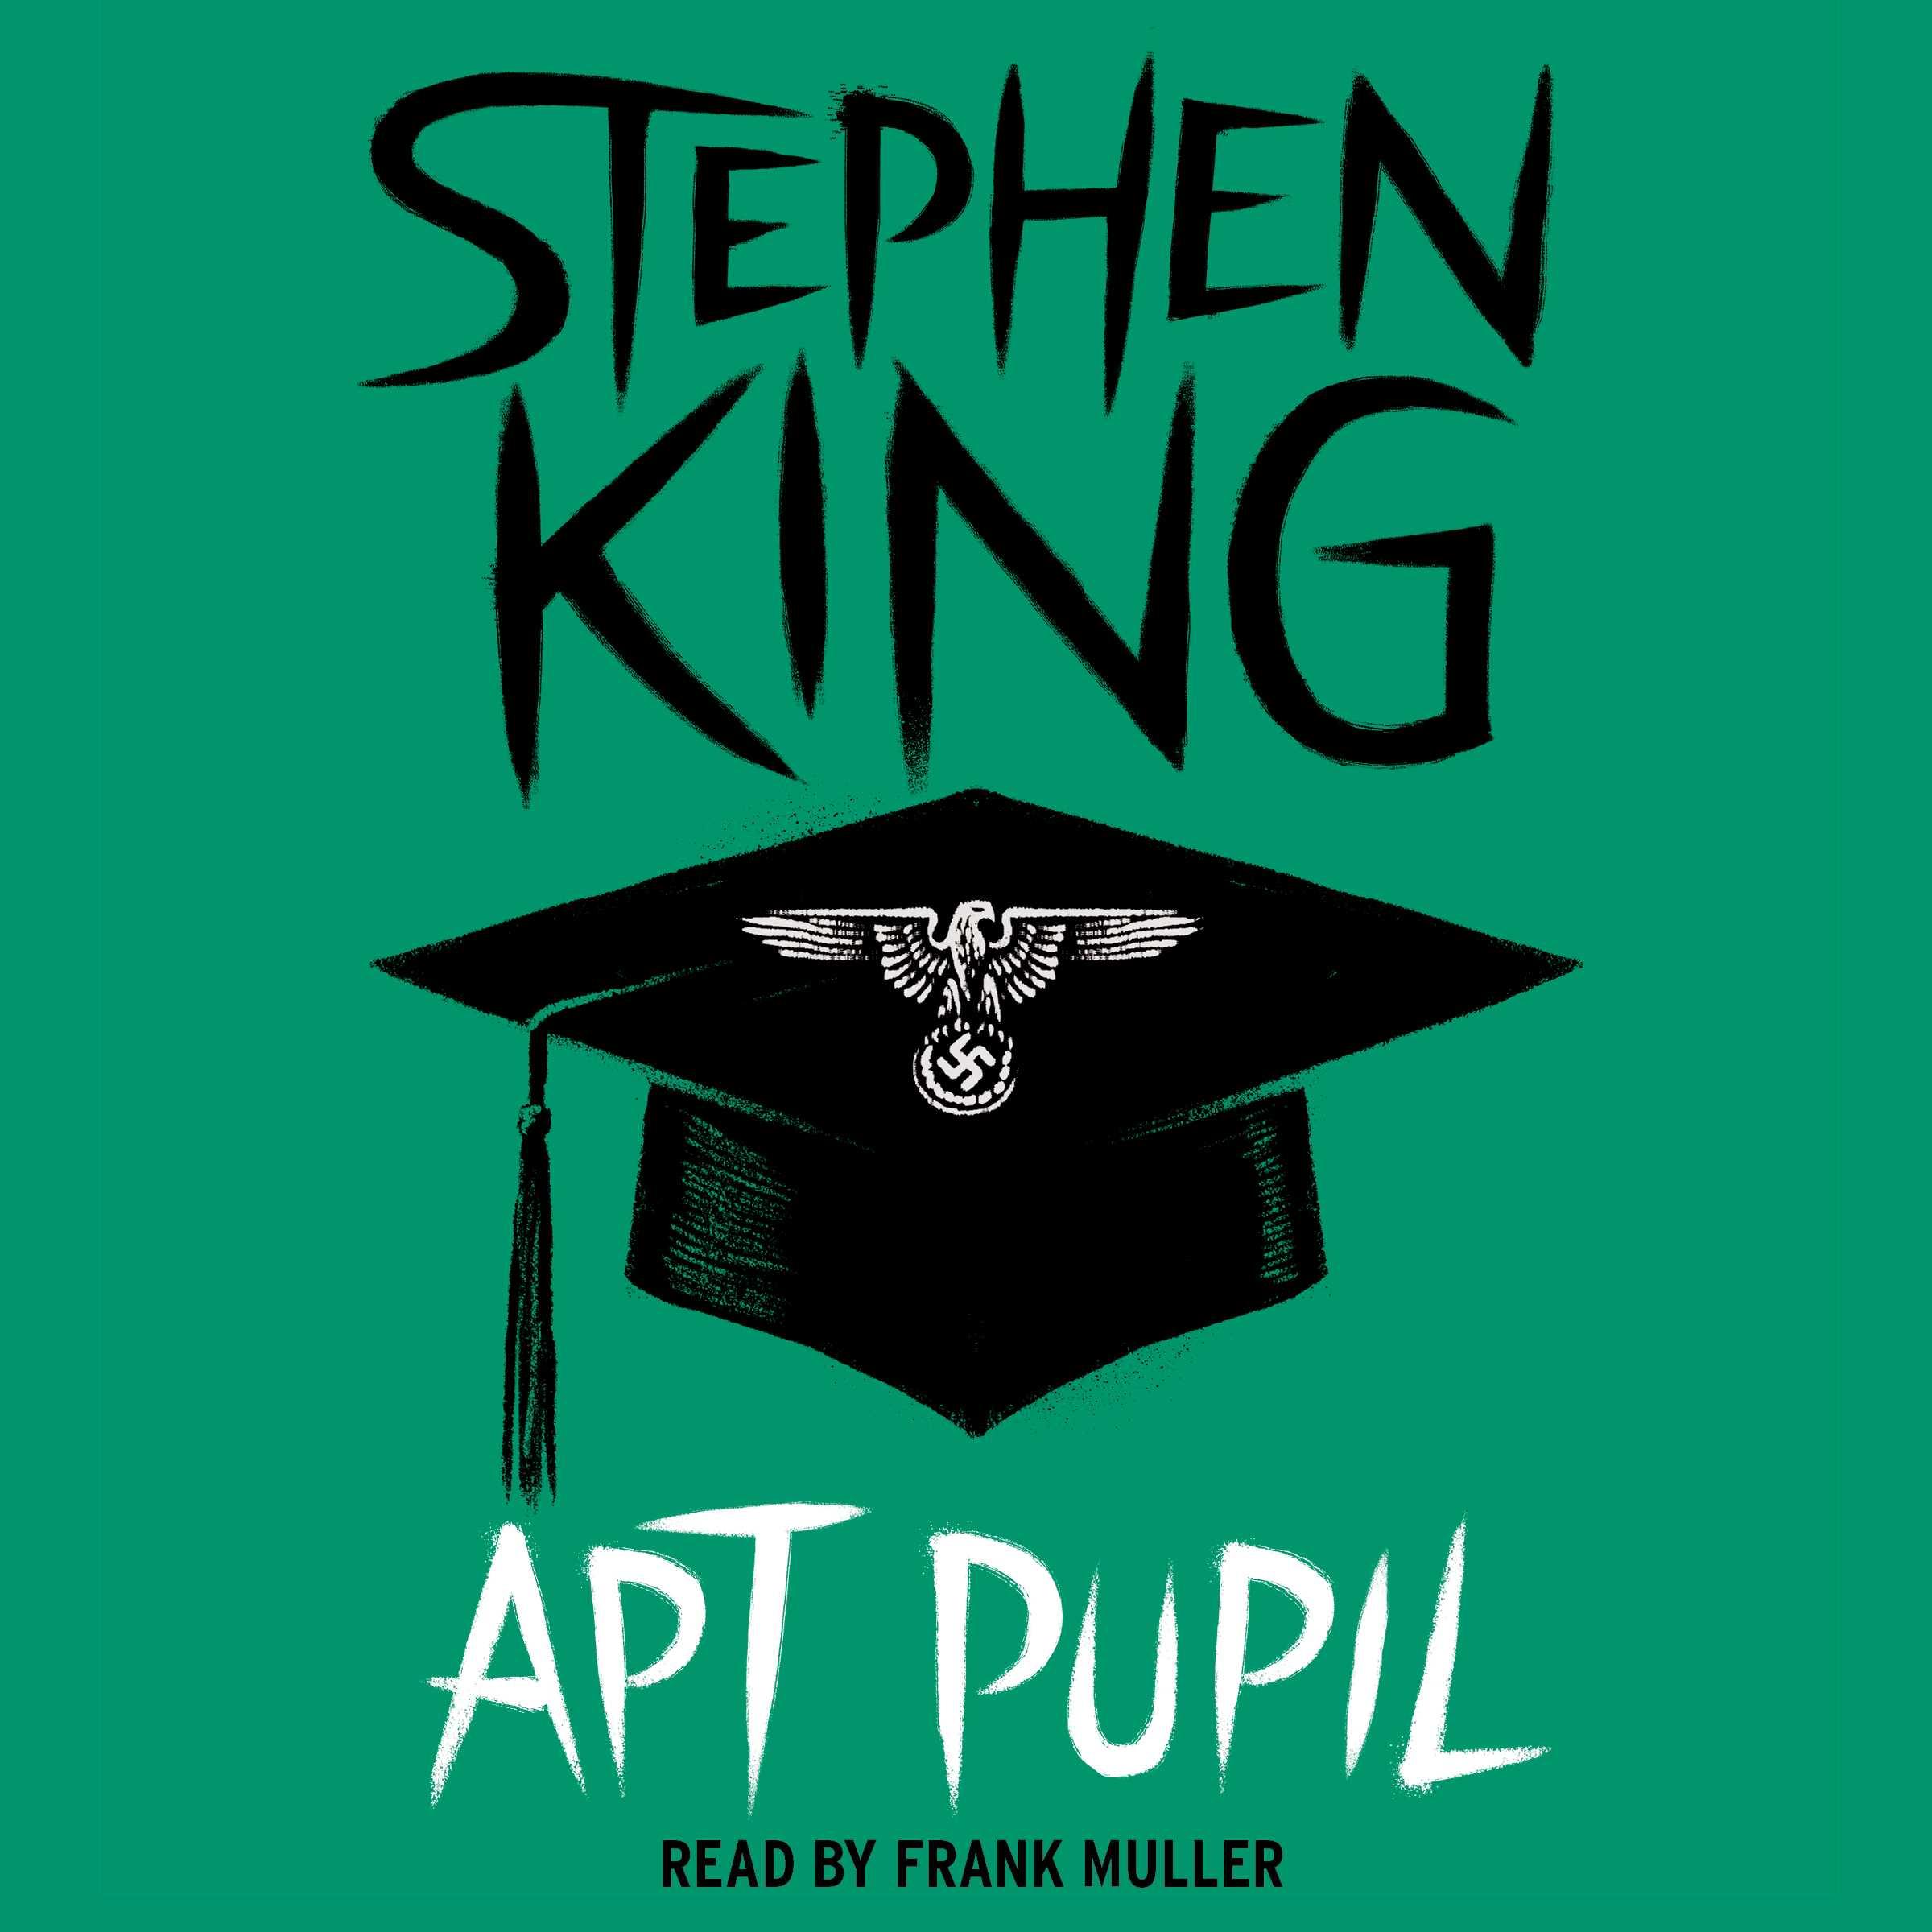 Stephen King bibliography